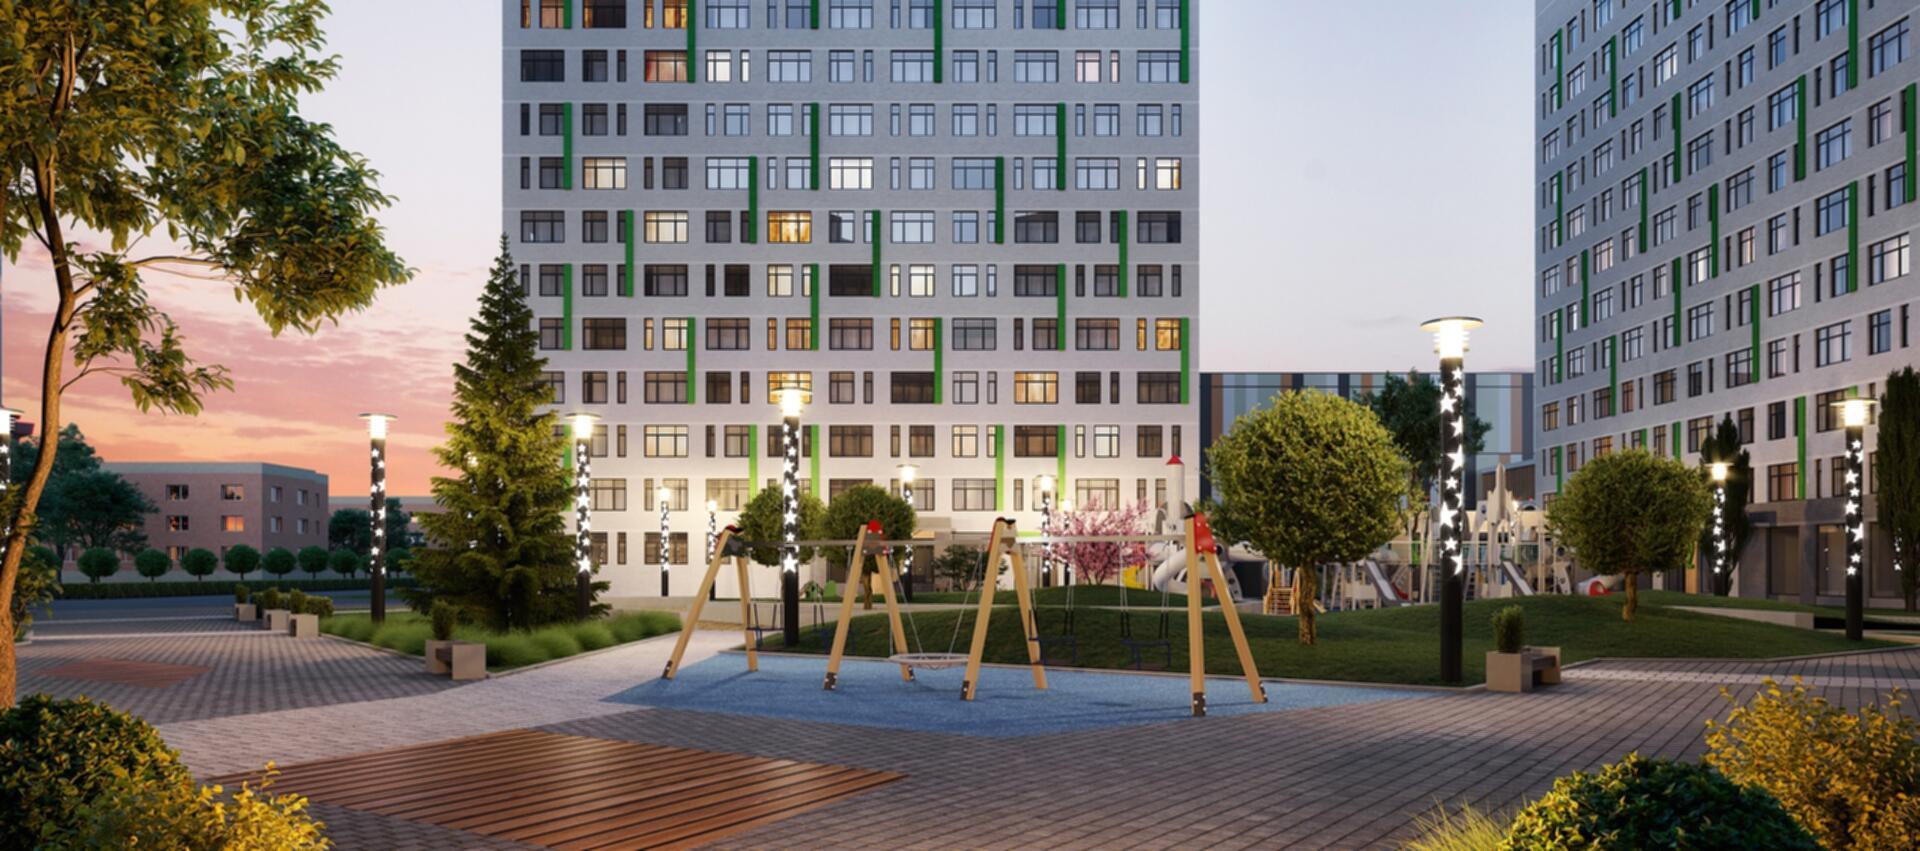 Квартир в новостройке возле ТРЦ «Сити Молл» со скидкой 300 000 рублей